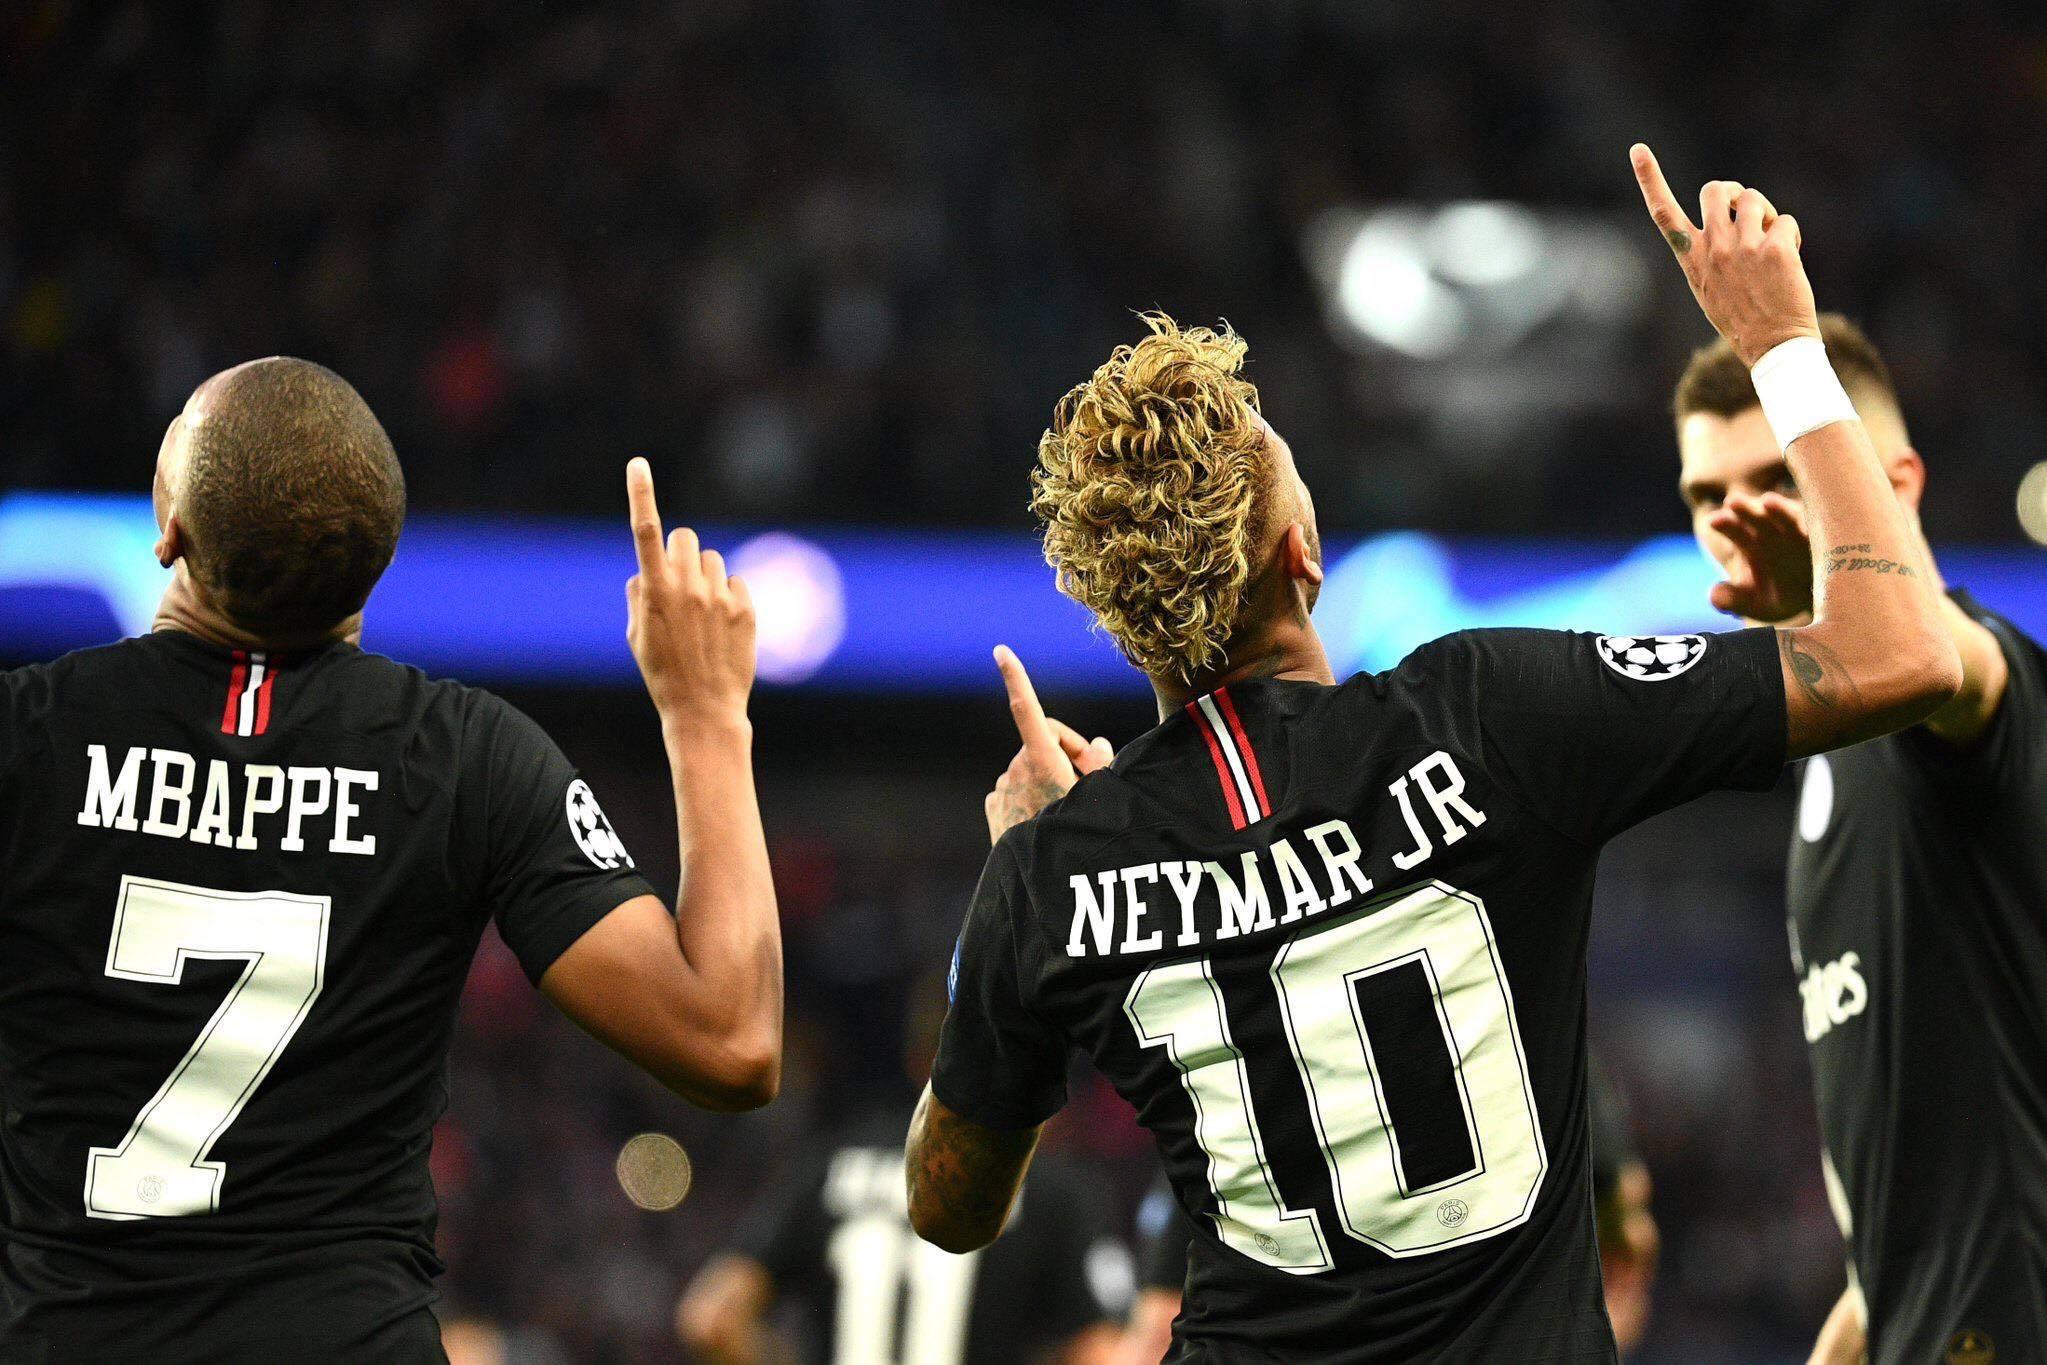 Football, Neymar, Sports, UEFA